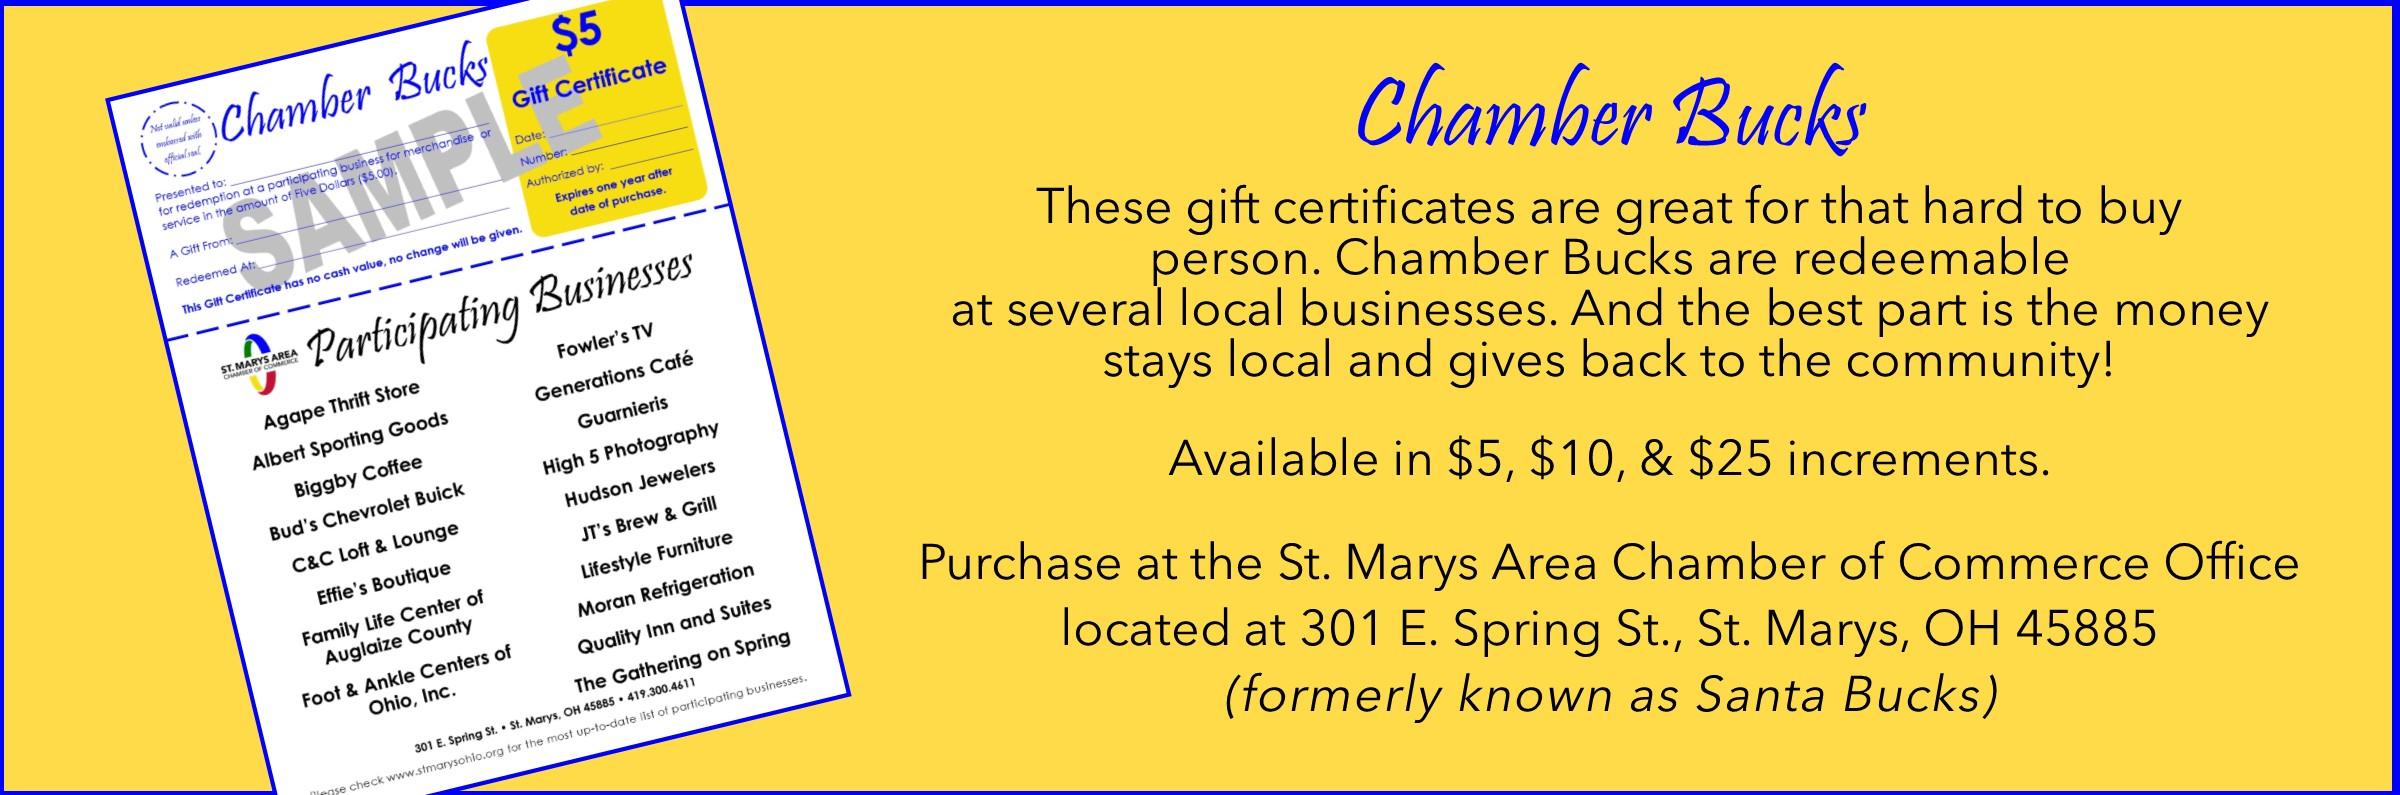 Chamber-Bucks.jpg